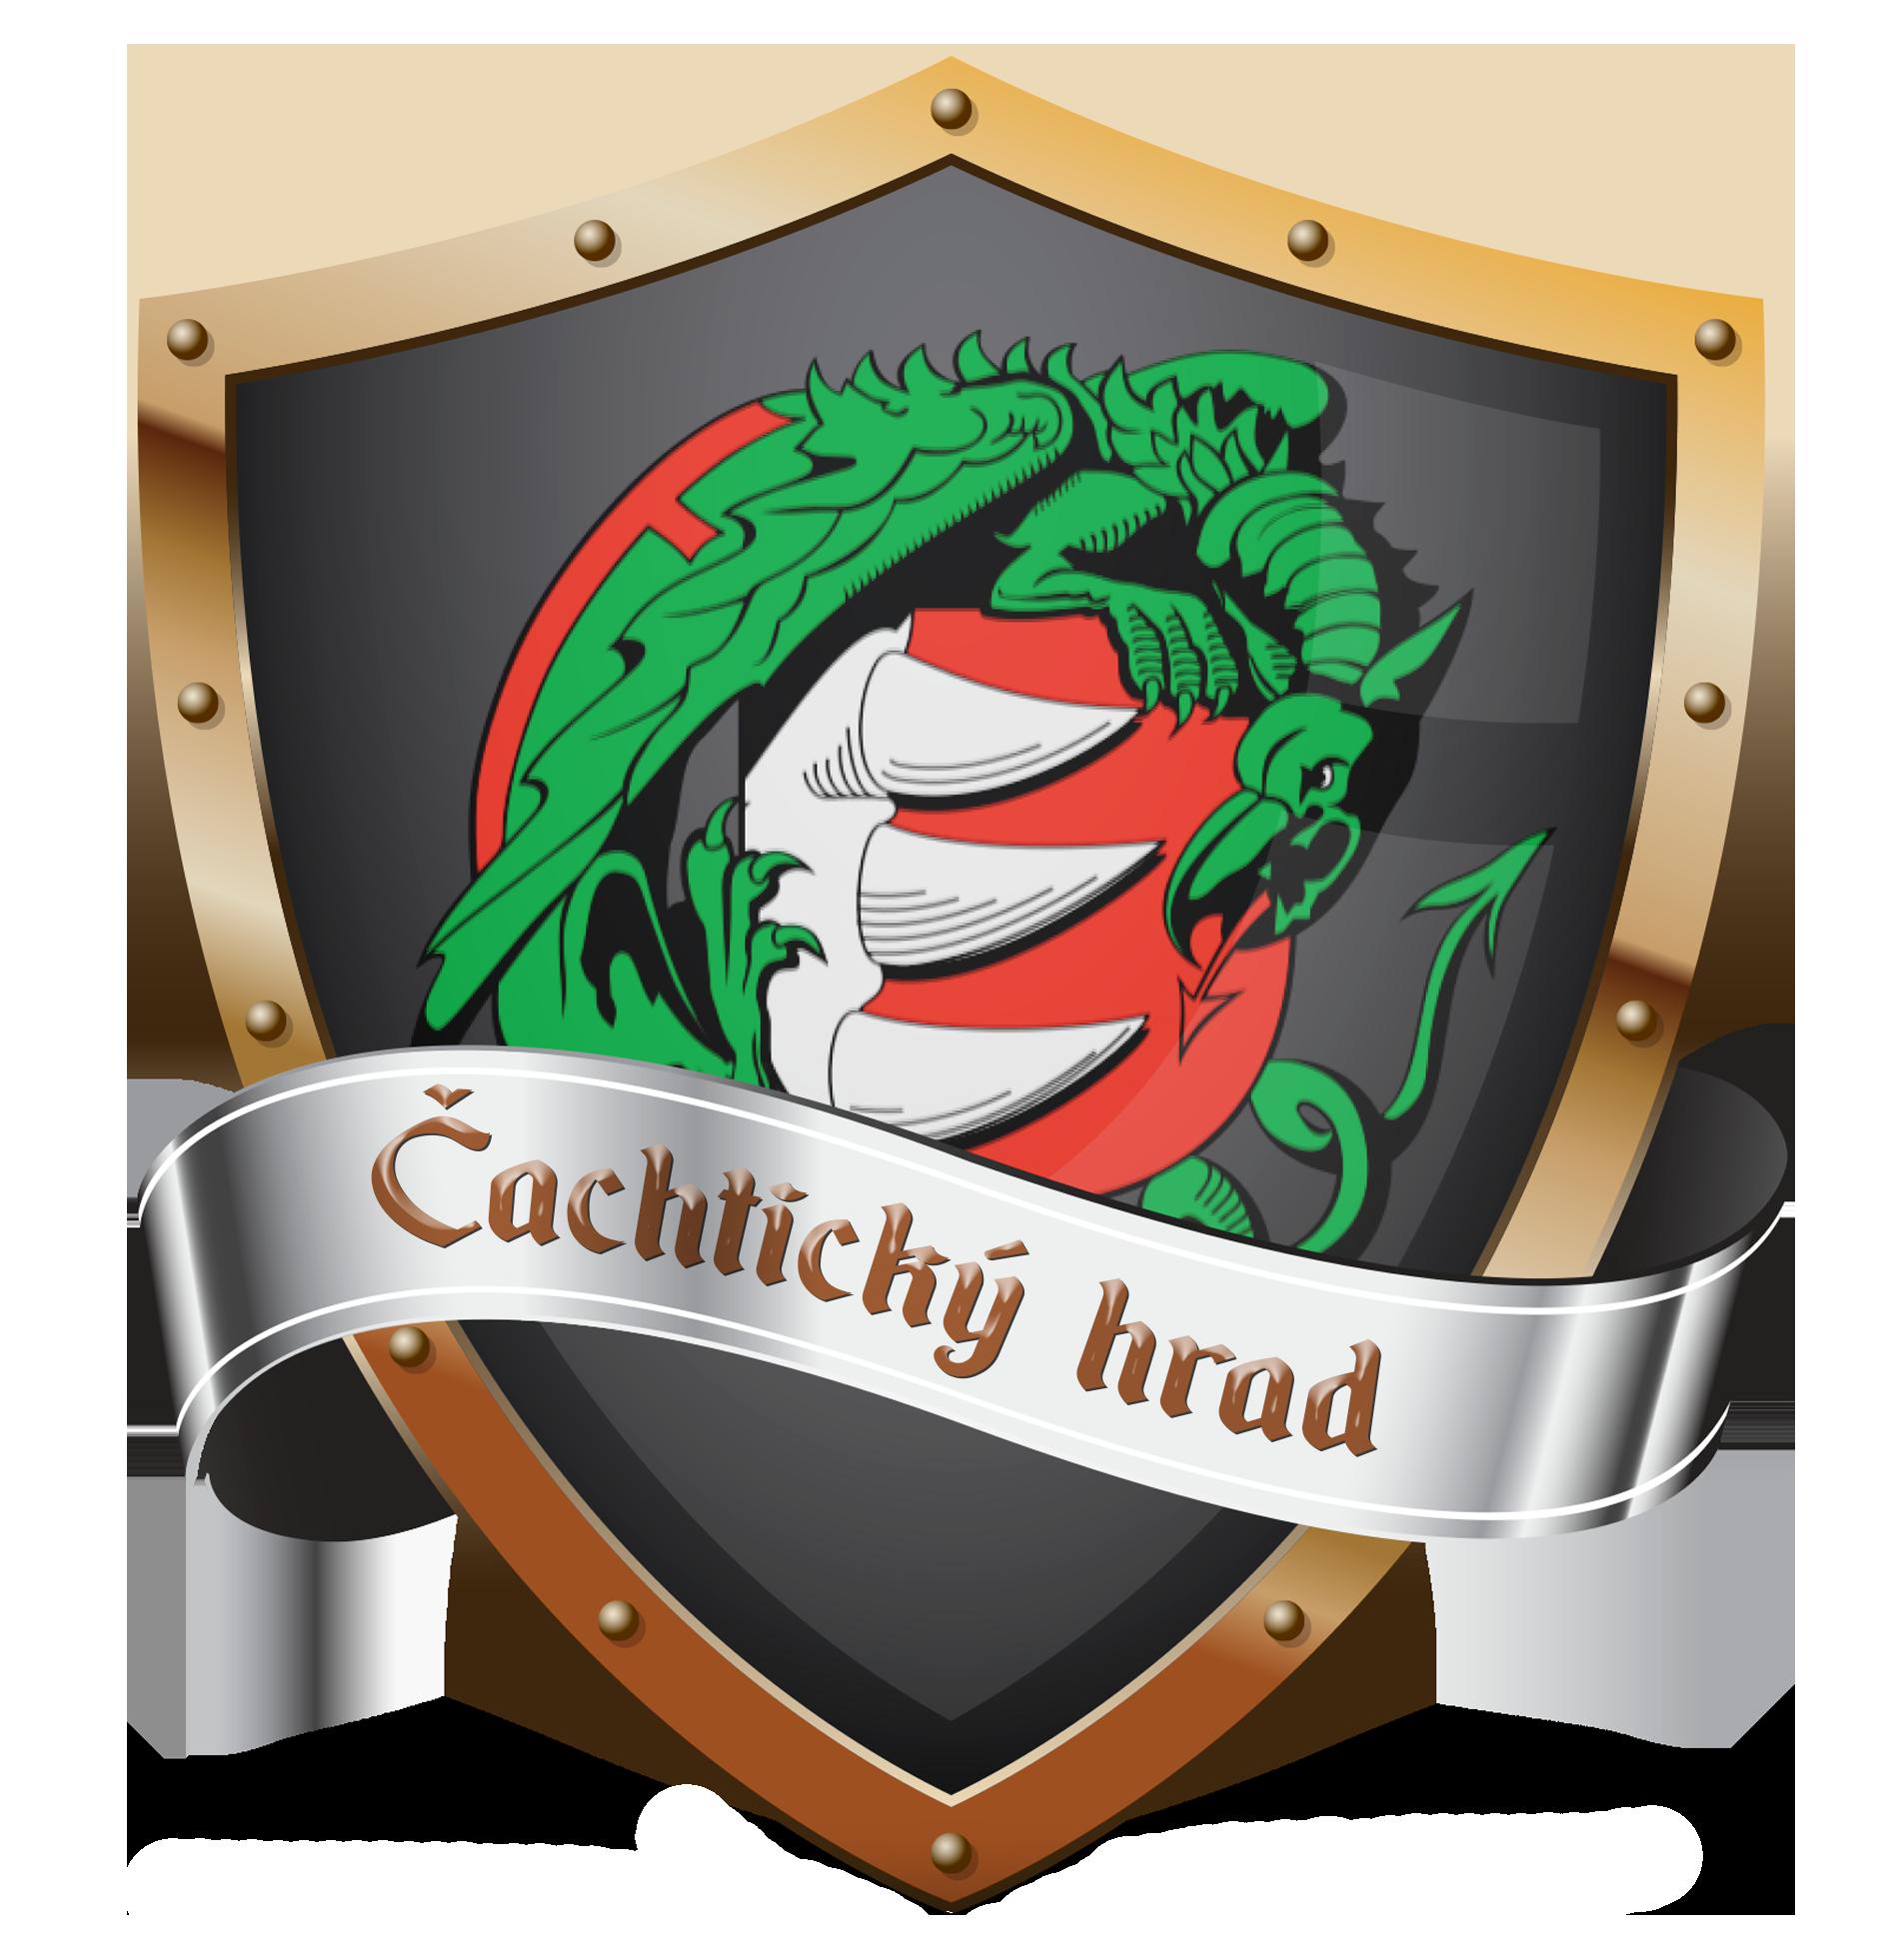 Cachticky hrad - logo